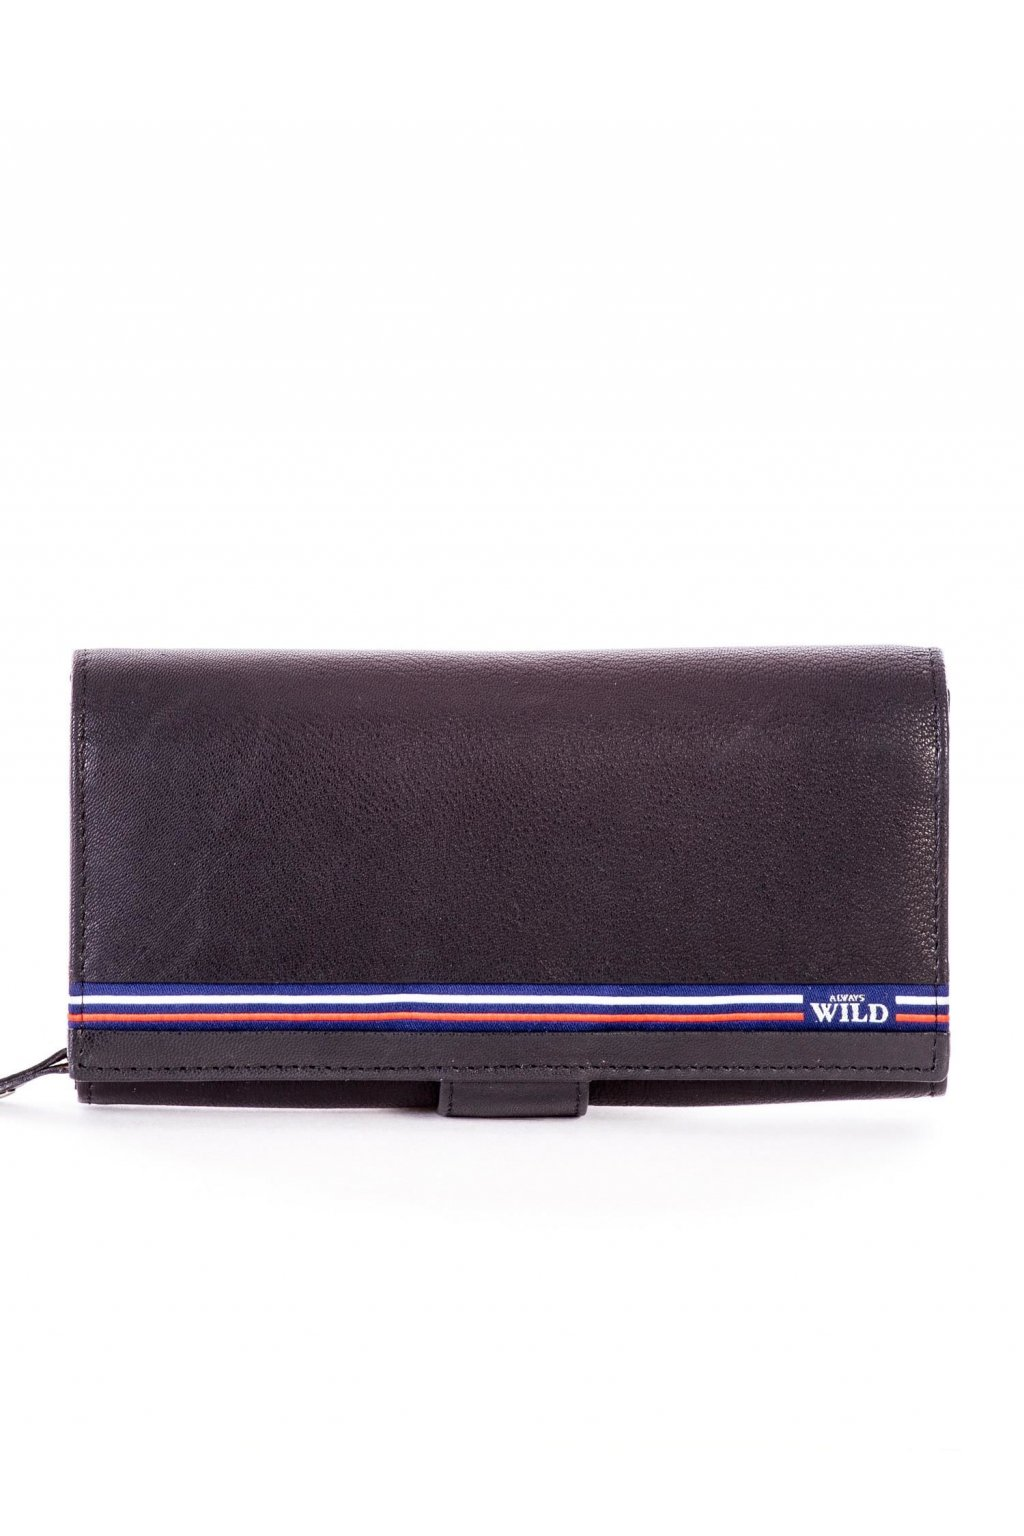 Peňaženka kód CE-PR-N567-GV.63